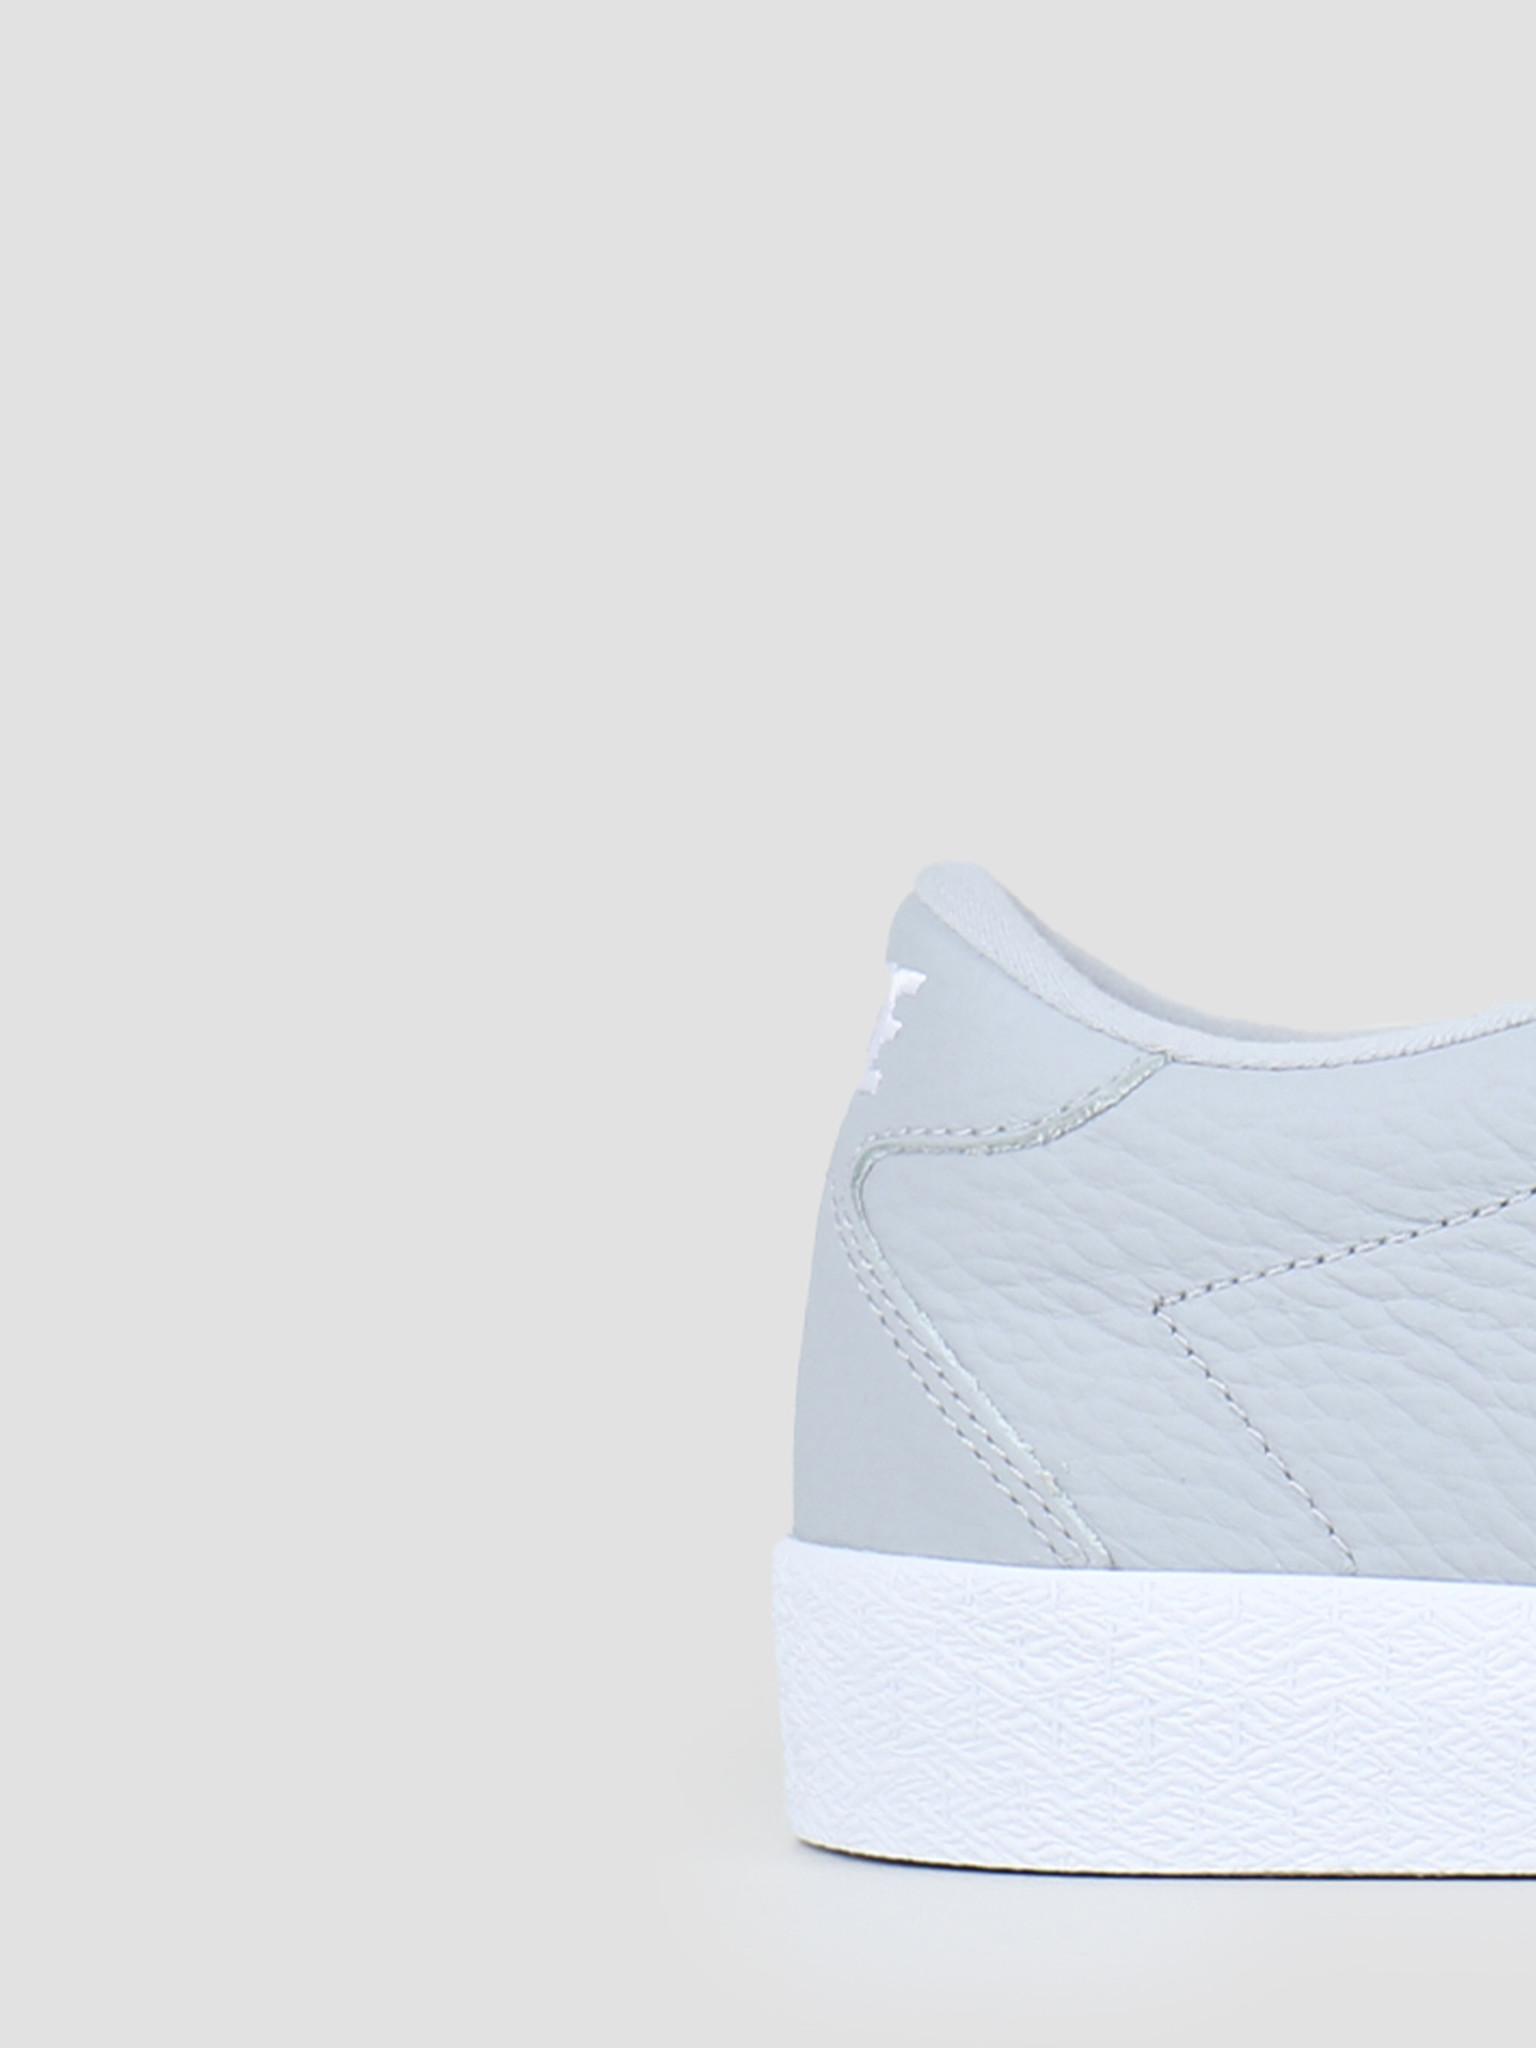 Nike Nike SB Zoom Bruin Wolf Grey White Wolf Grey White AQ7941-008